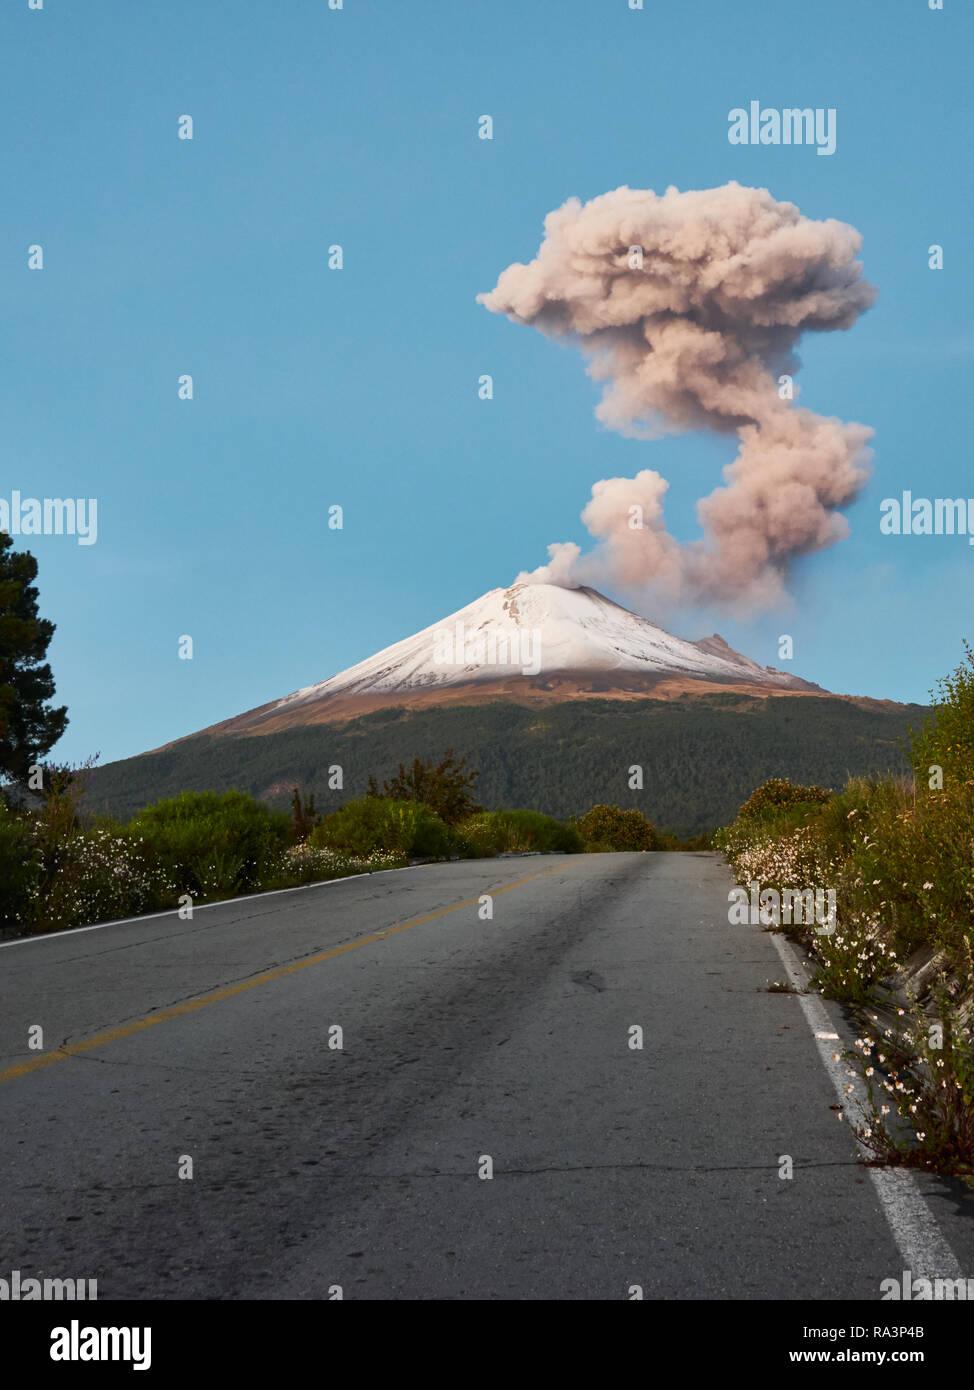 Fumaroles on Popocatepetl volcano seen from the street Ruta de Evacuacion at morning - Stock Image